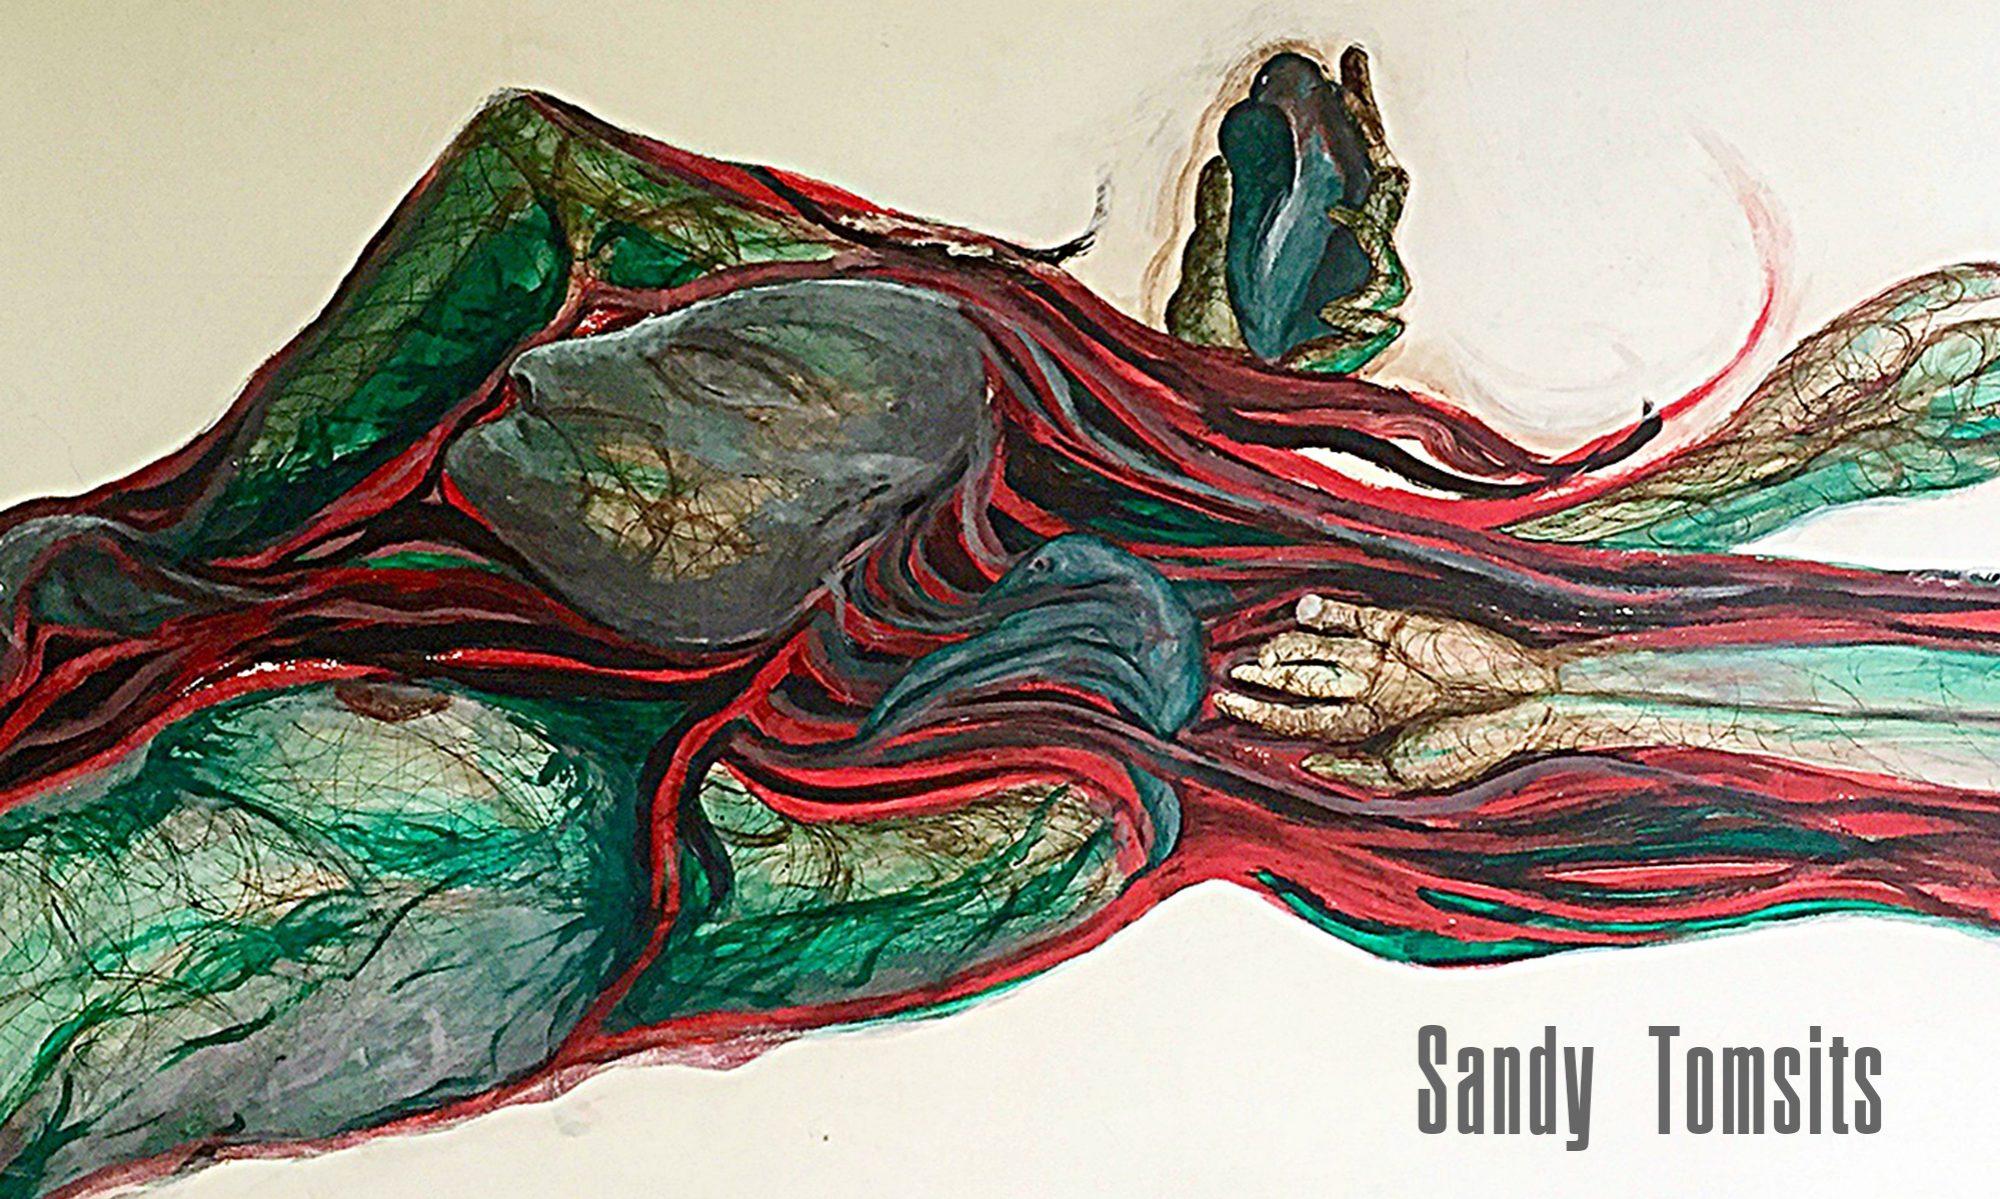 Sandy Tomsits